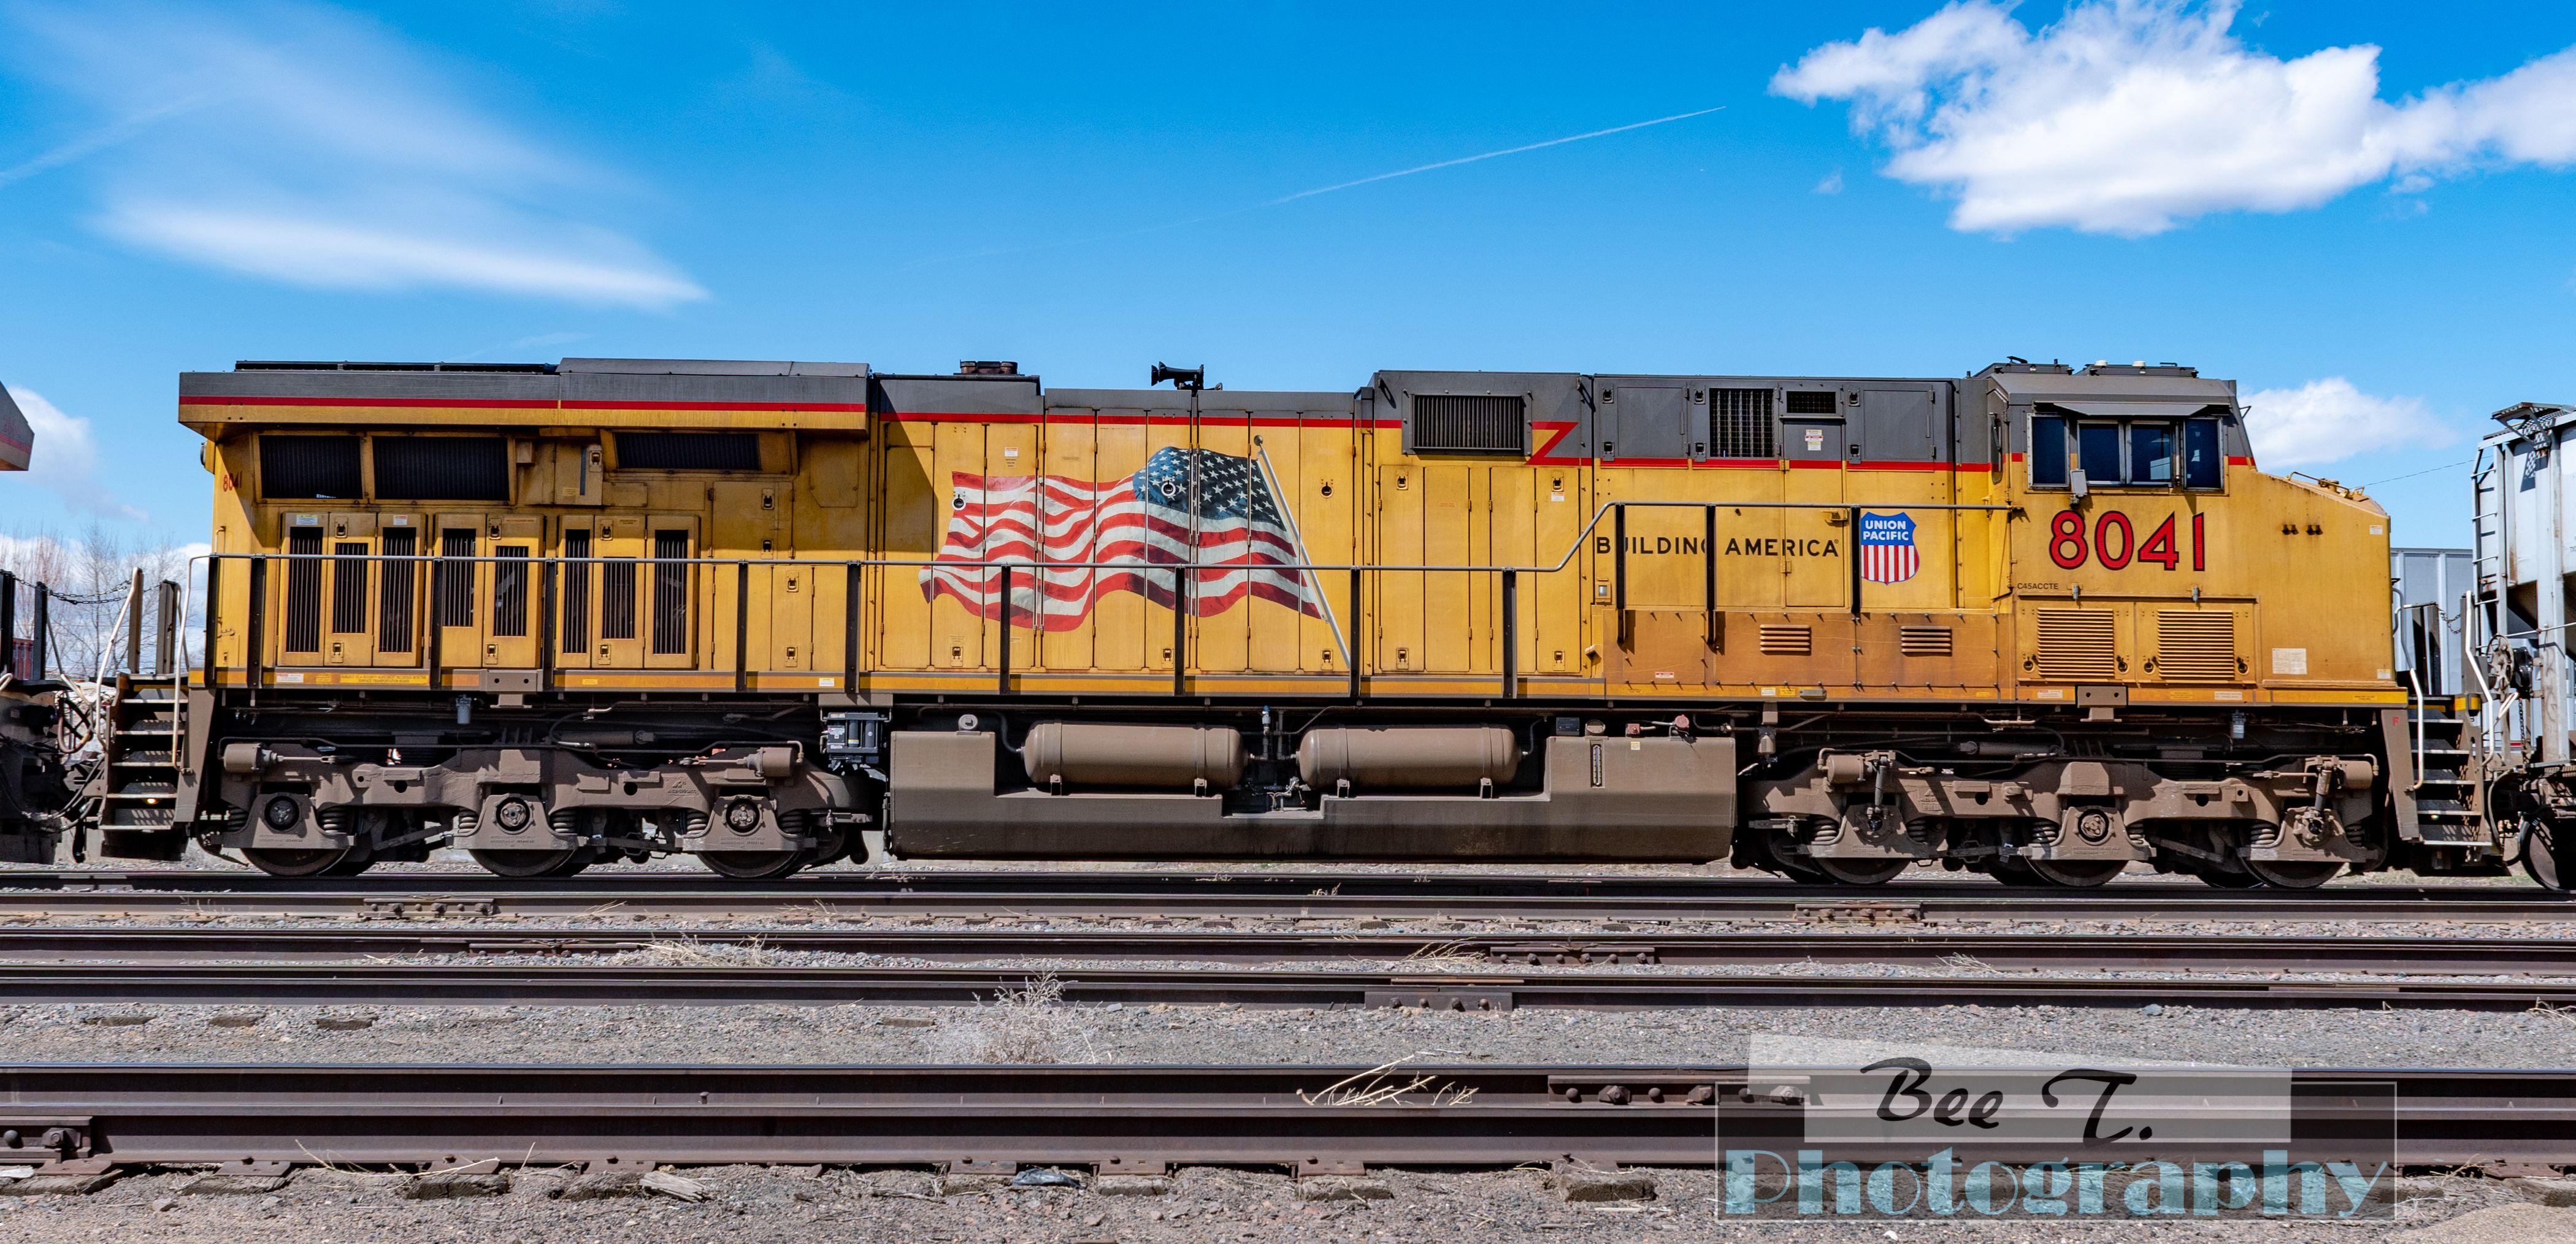 Up 8041 Train Engine Pulls Long Line Of Cars Train Train Engines Train Photography